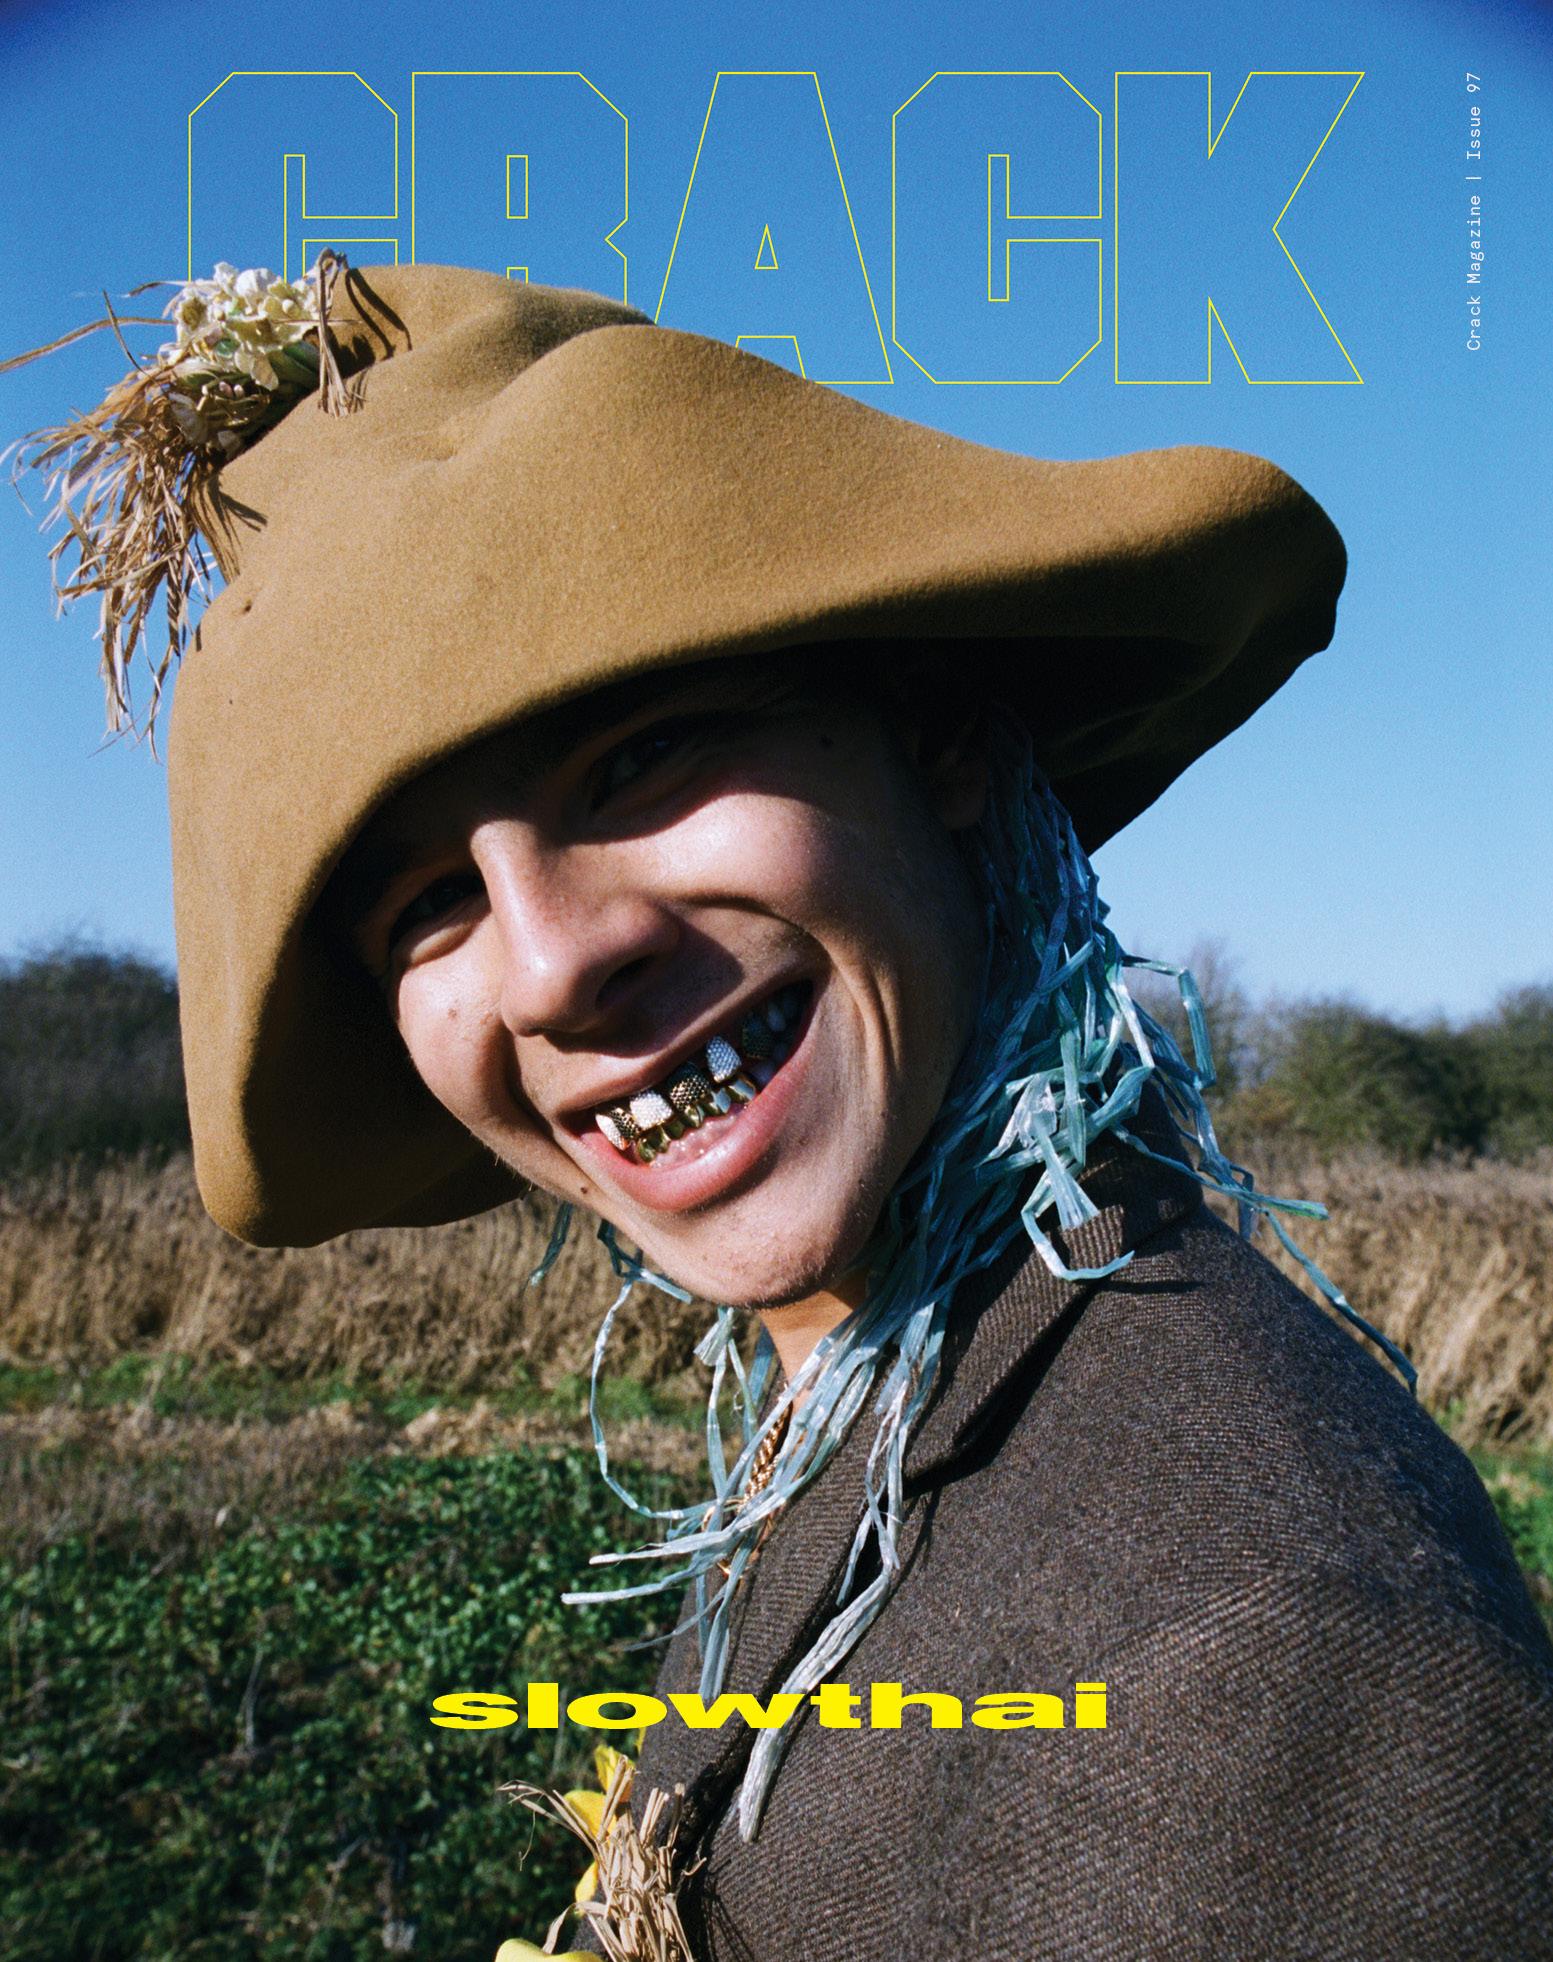 slowthai CRACK Pg1 02:19.jpg